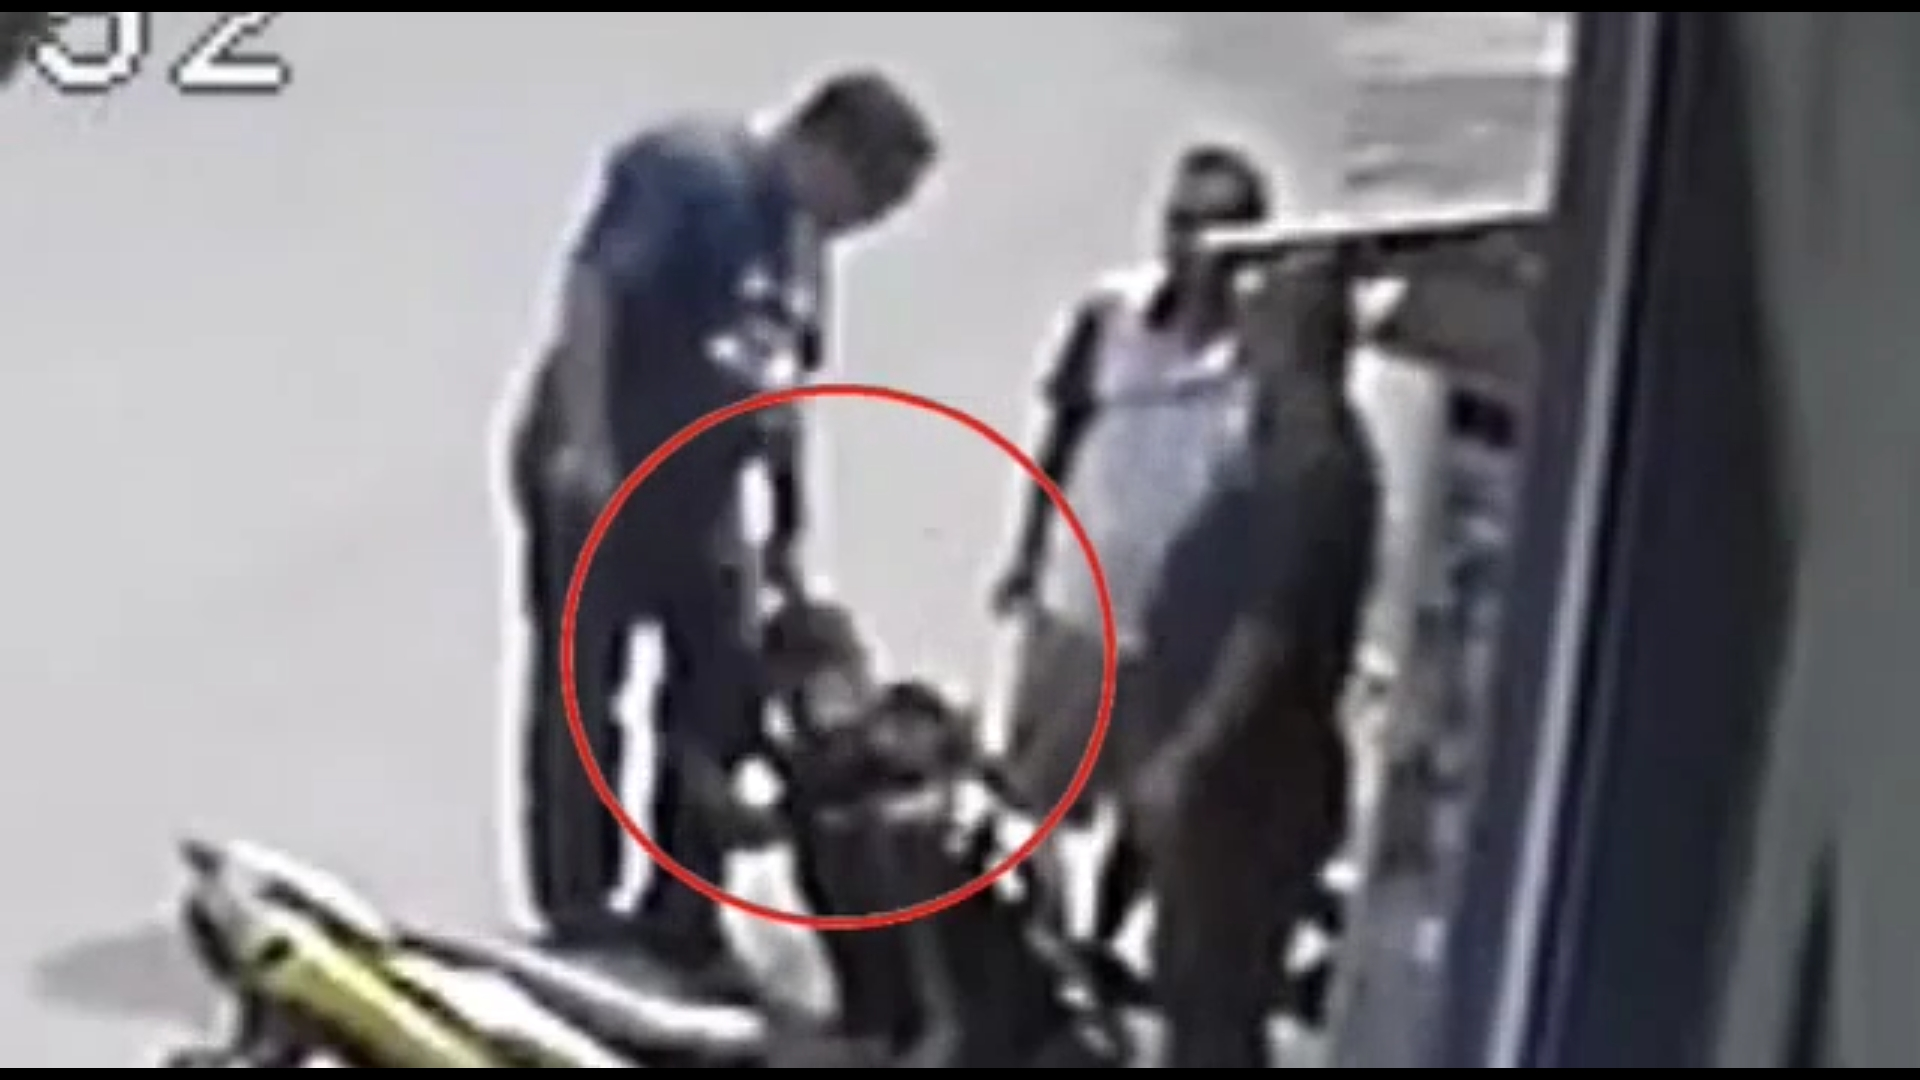 https: img-k.okeinfo.net content 2019 11 15 338 2130267 rekaman-cctv-pria-diduga-polisi-aniaya-pemuda-di-bogor-jadi-viral-oSetytHucI.jpg